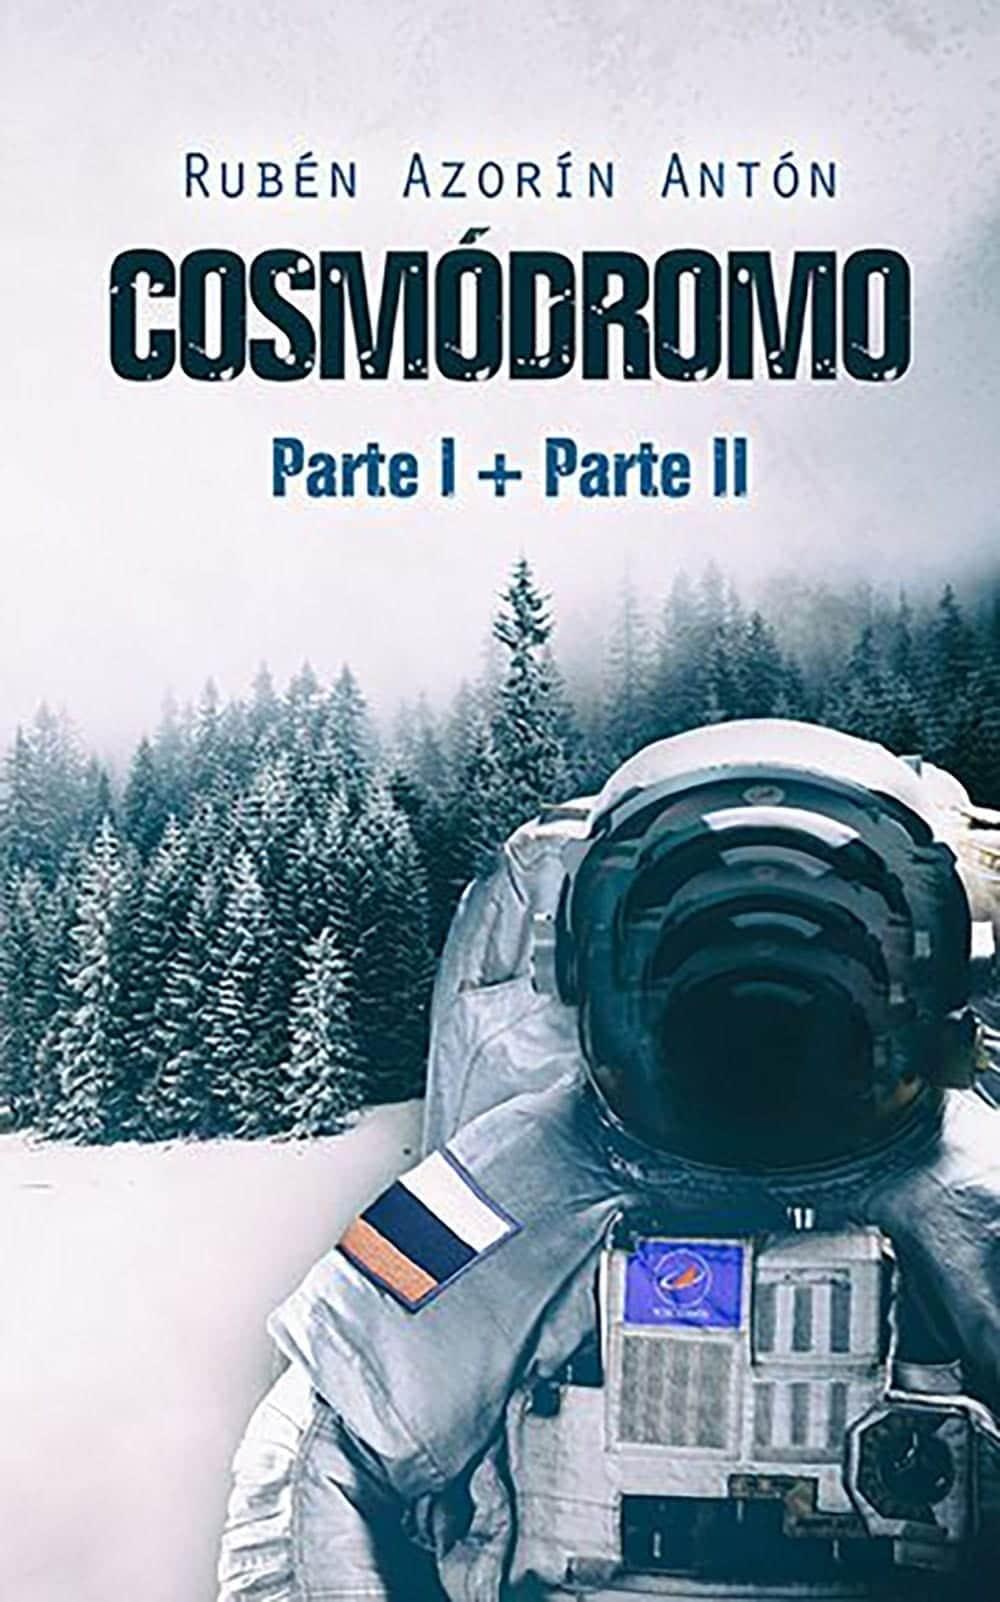 1552645978 Portada digital Cosmo dromo 1 2 Astronauta